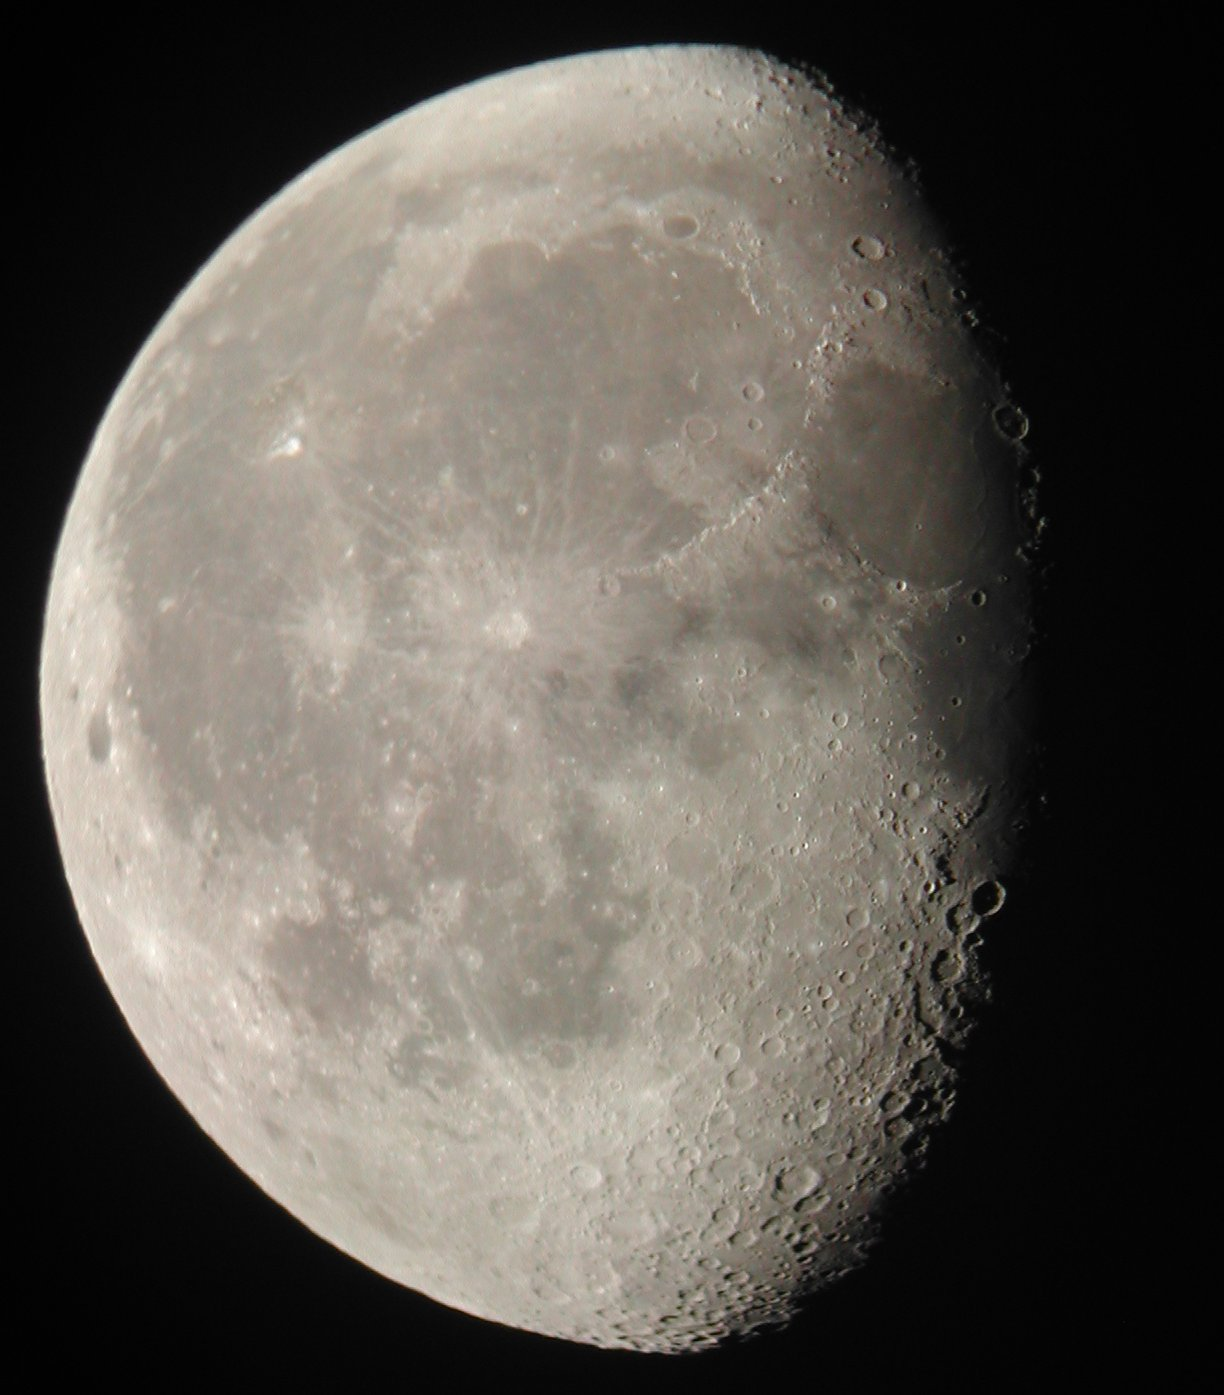 moon-19day-2831.jpg